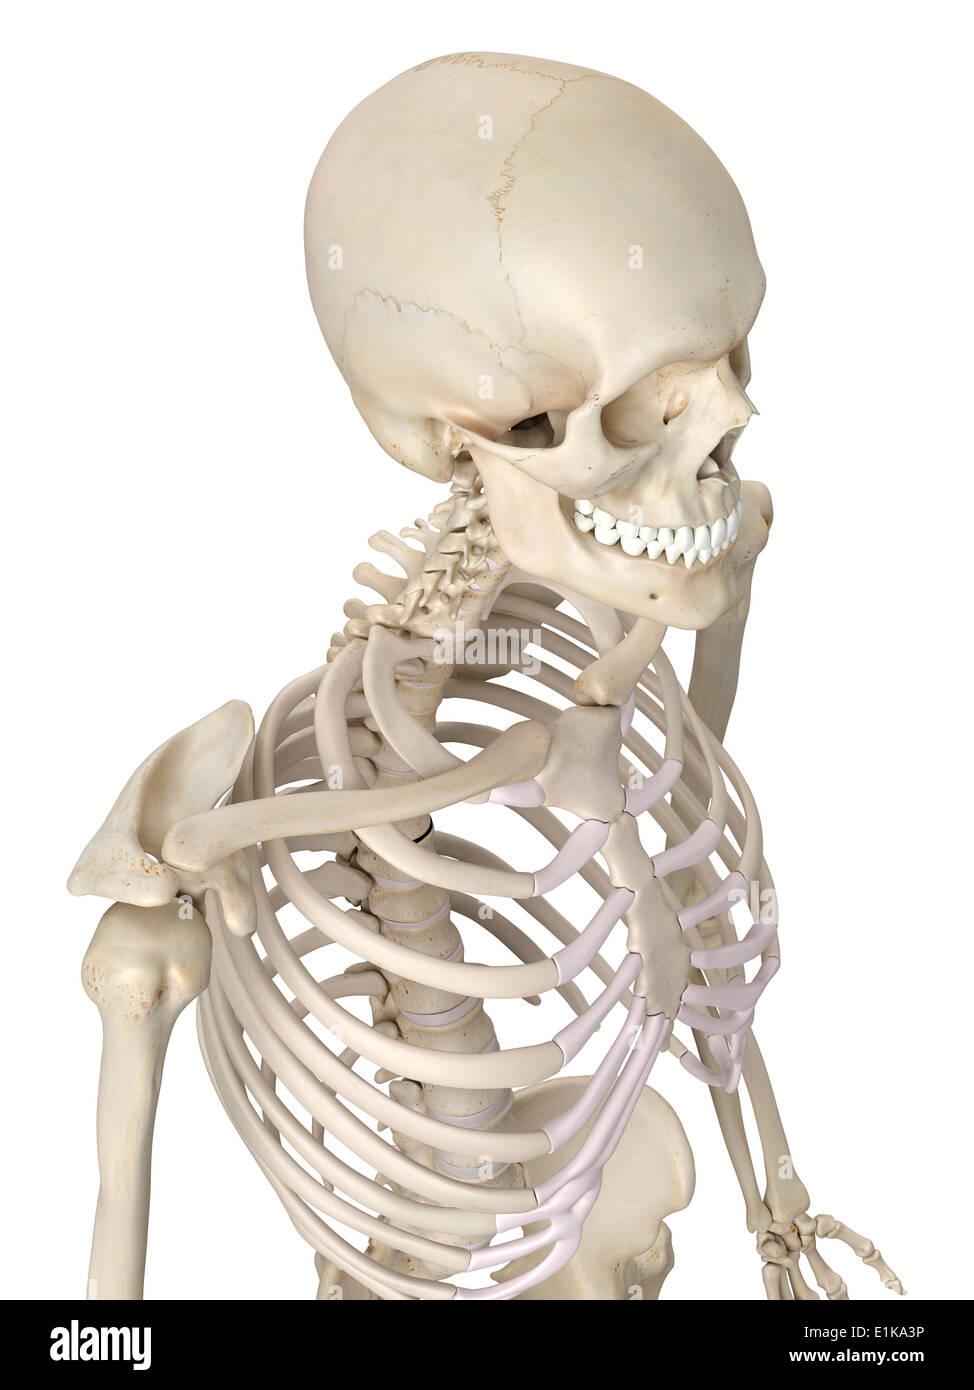 Human thorax anatomy computer artwork Stock Photo: 69881162 - Alamy